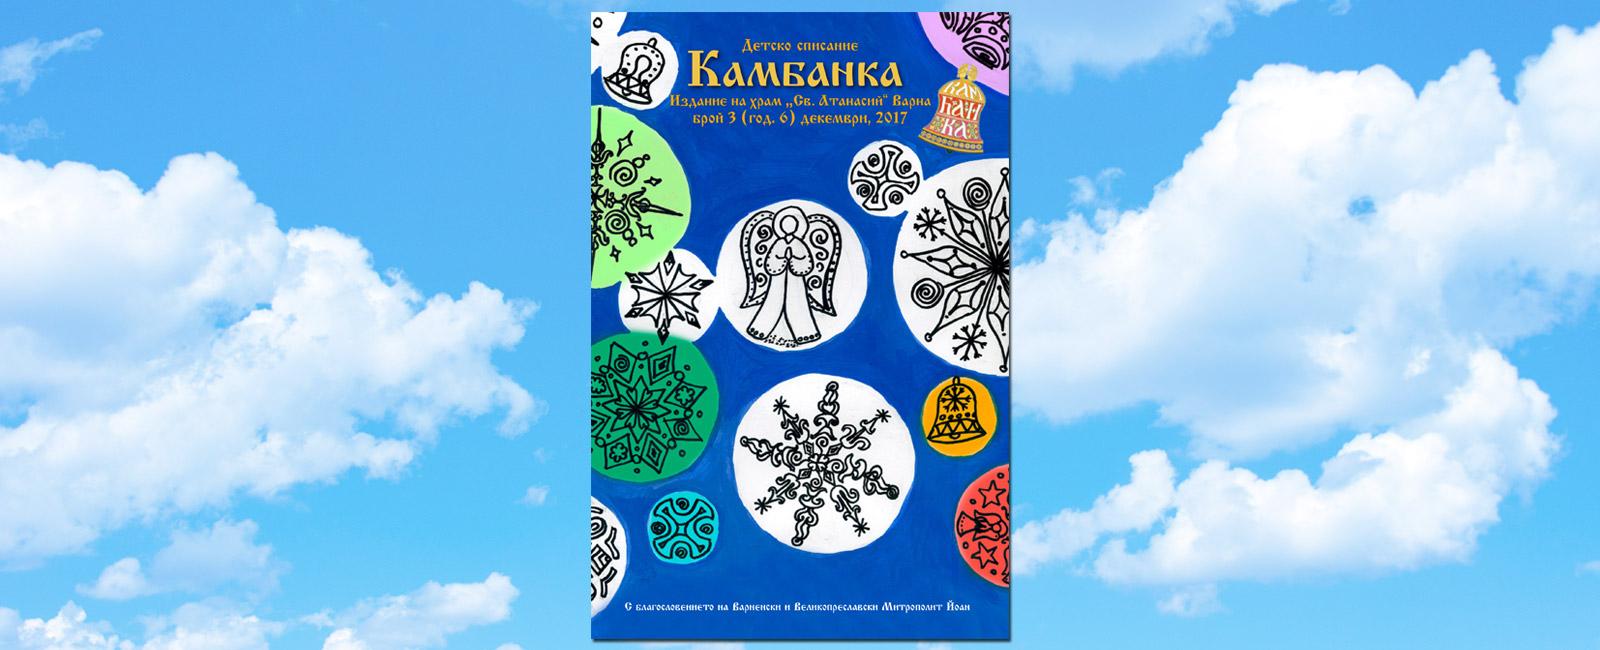 Kambanka_20171-12